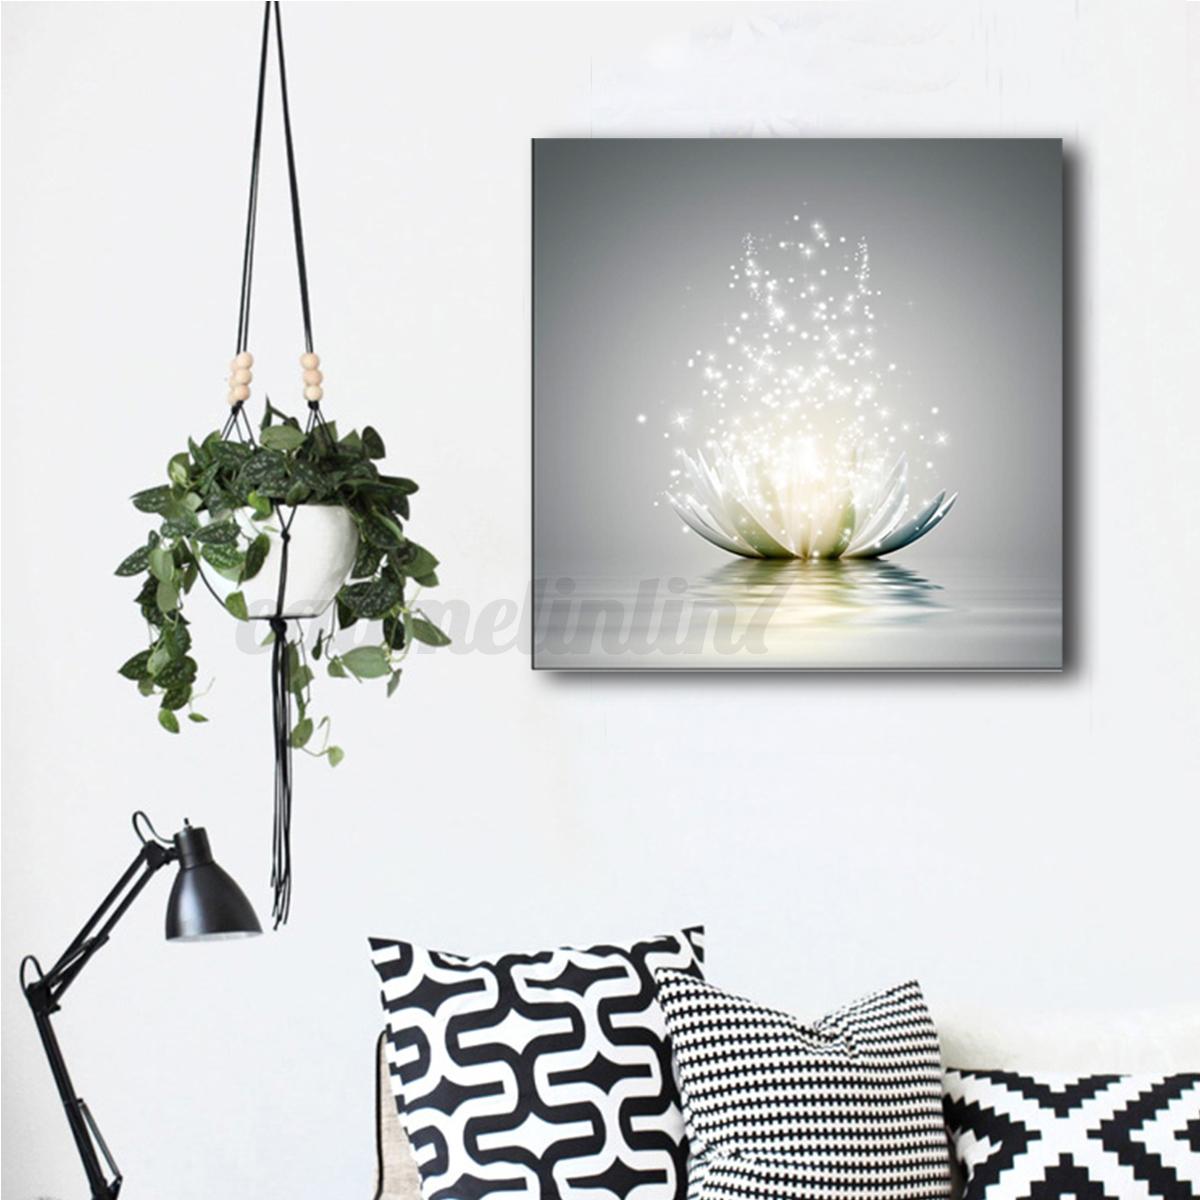 Modern Art For Home Decor: Framed Abstract Art Canvas Print Modern Oil Painting